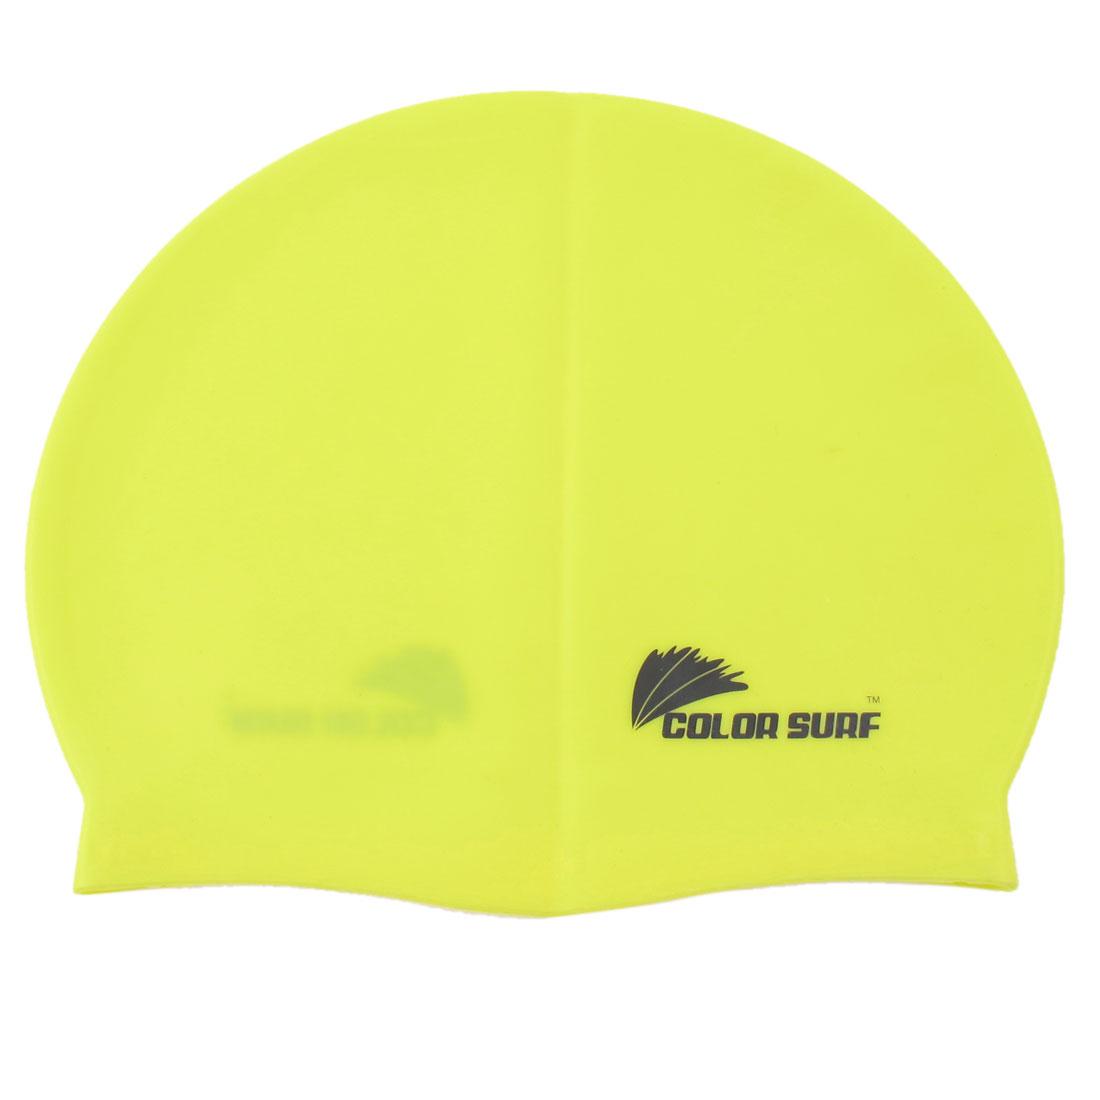 Unisex Waterproof Silicone Flexible Swim Swimming Surfing Elastic Cap Hat Yellow